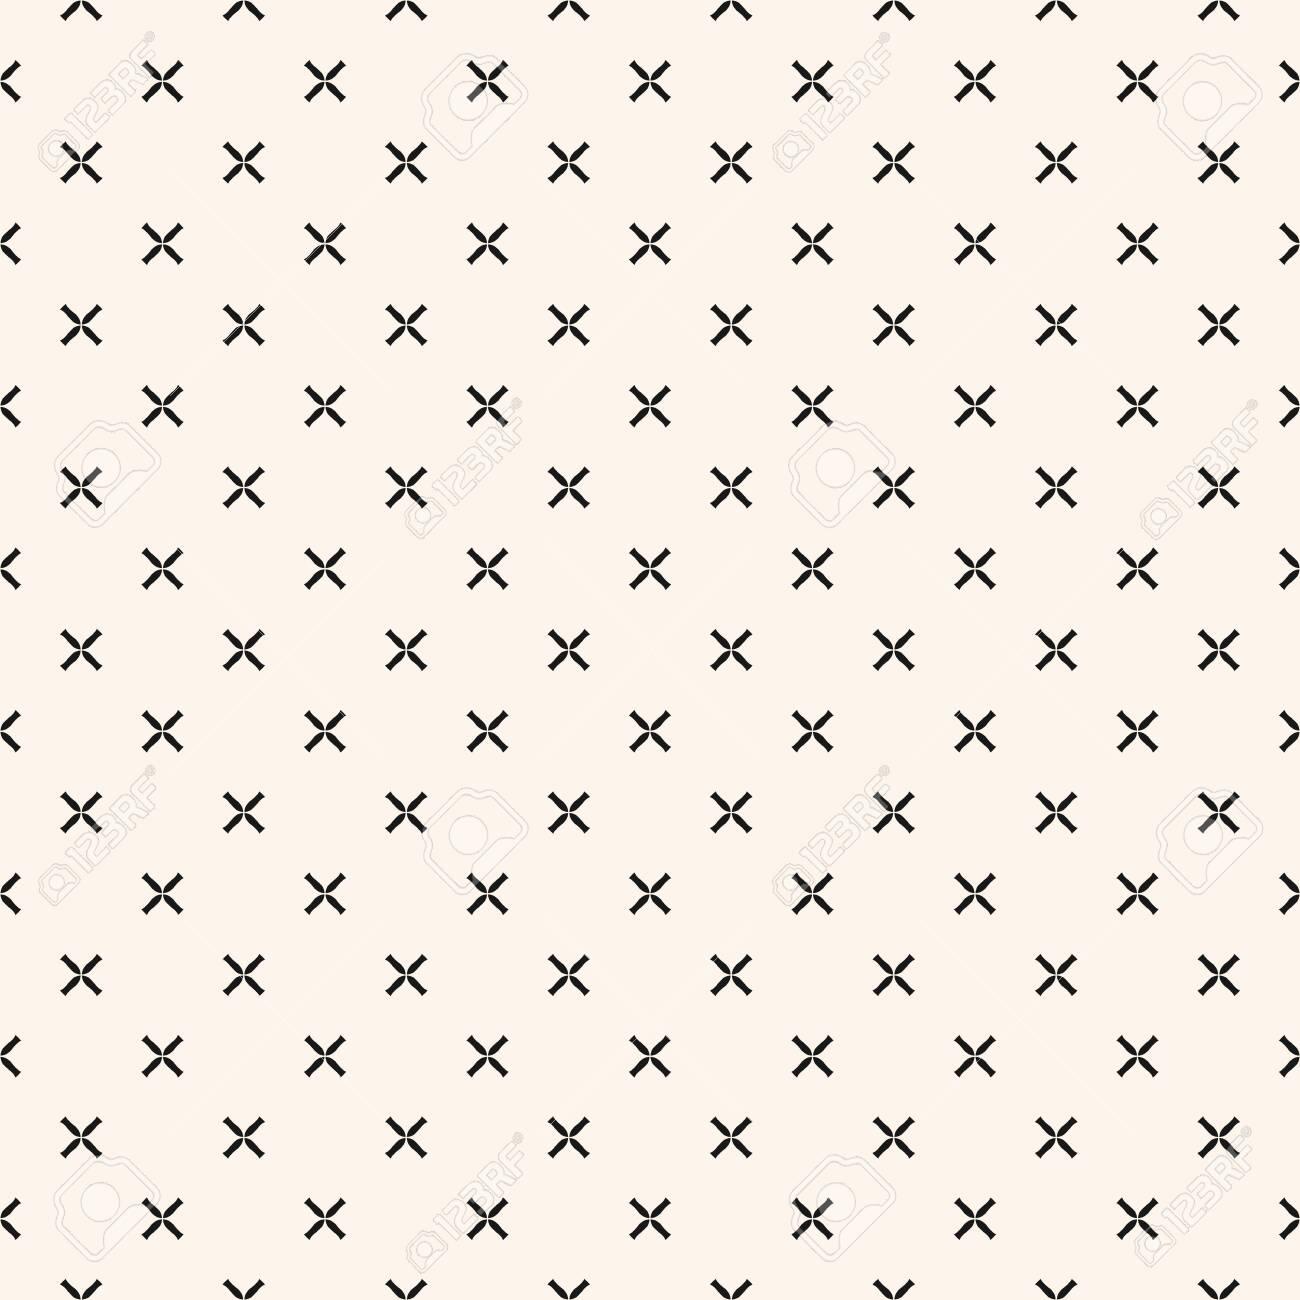 Simple Geometric Floral Pattern Black And White Minimalist